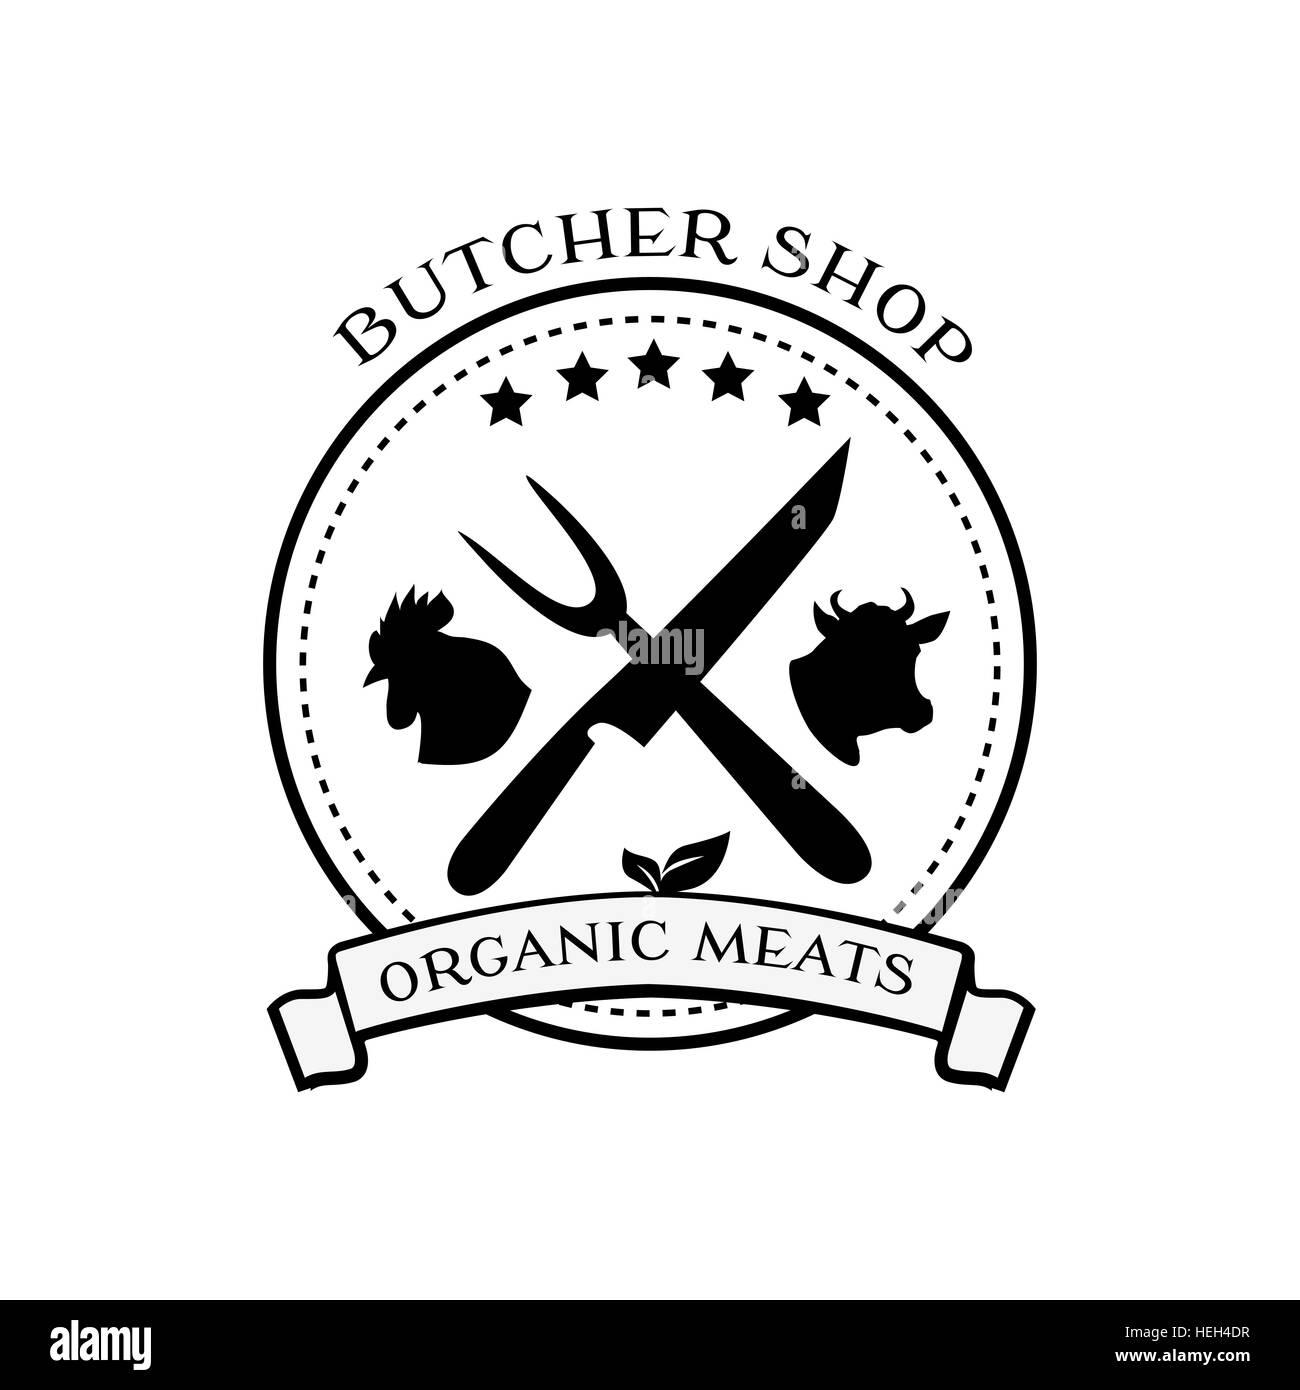 Butcher shop logo design elements, labels and badges in vintage style. Butcher shop logo, meat label template. Idea of logo for Stock Vector